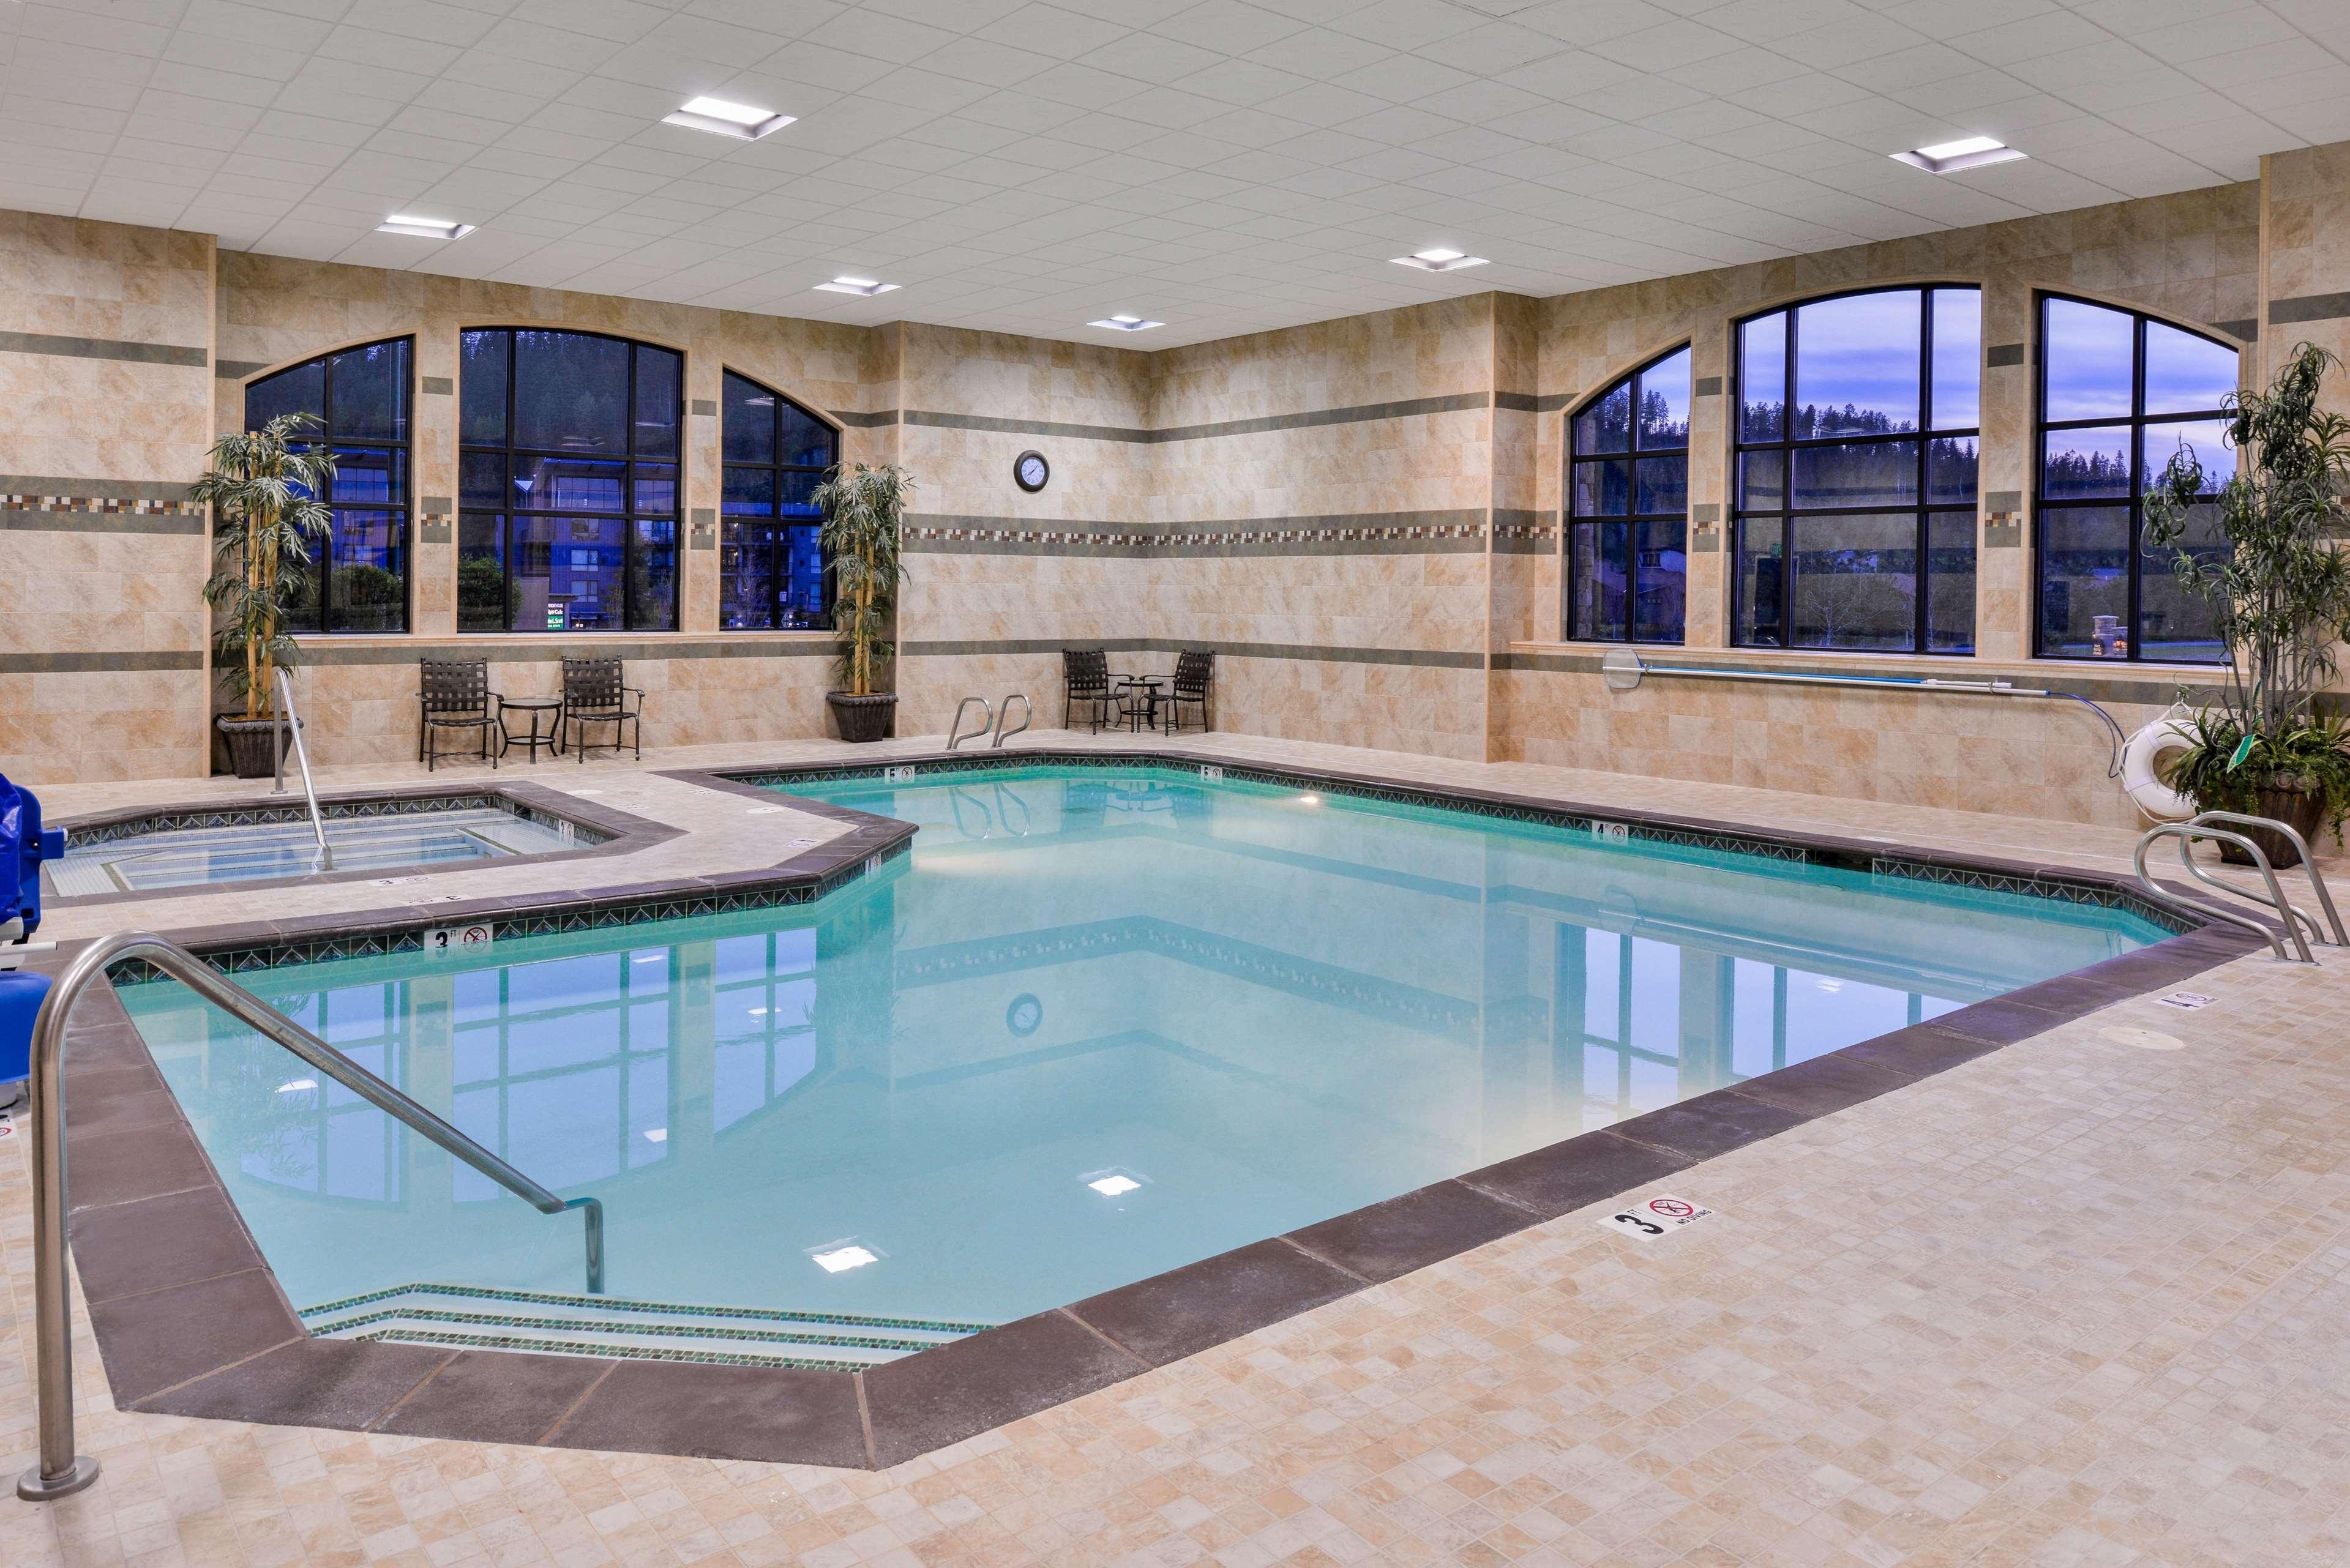 Hampton Inn & Suites Coeur d' Alene image 8